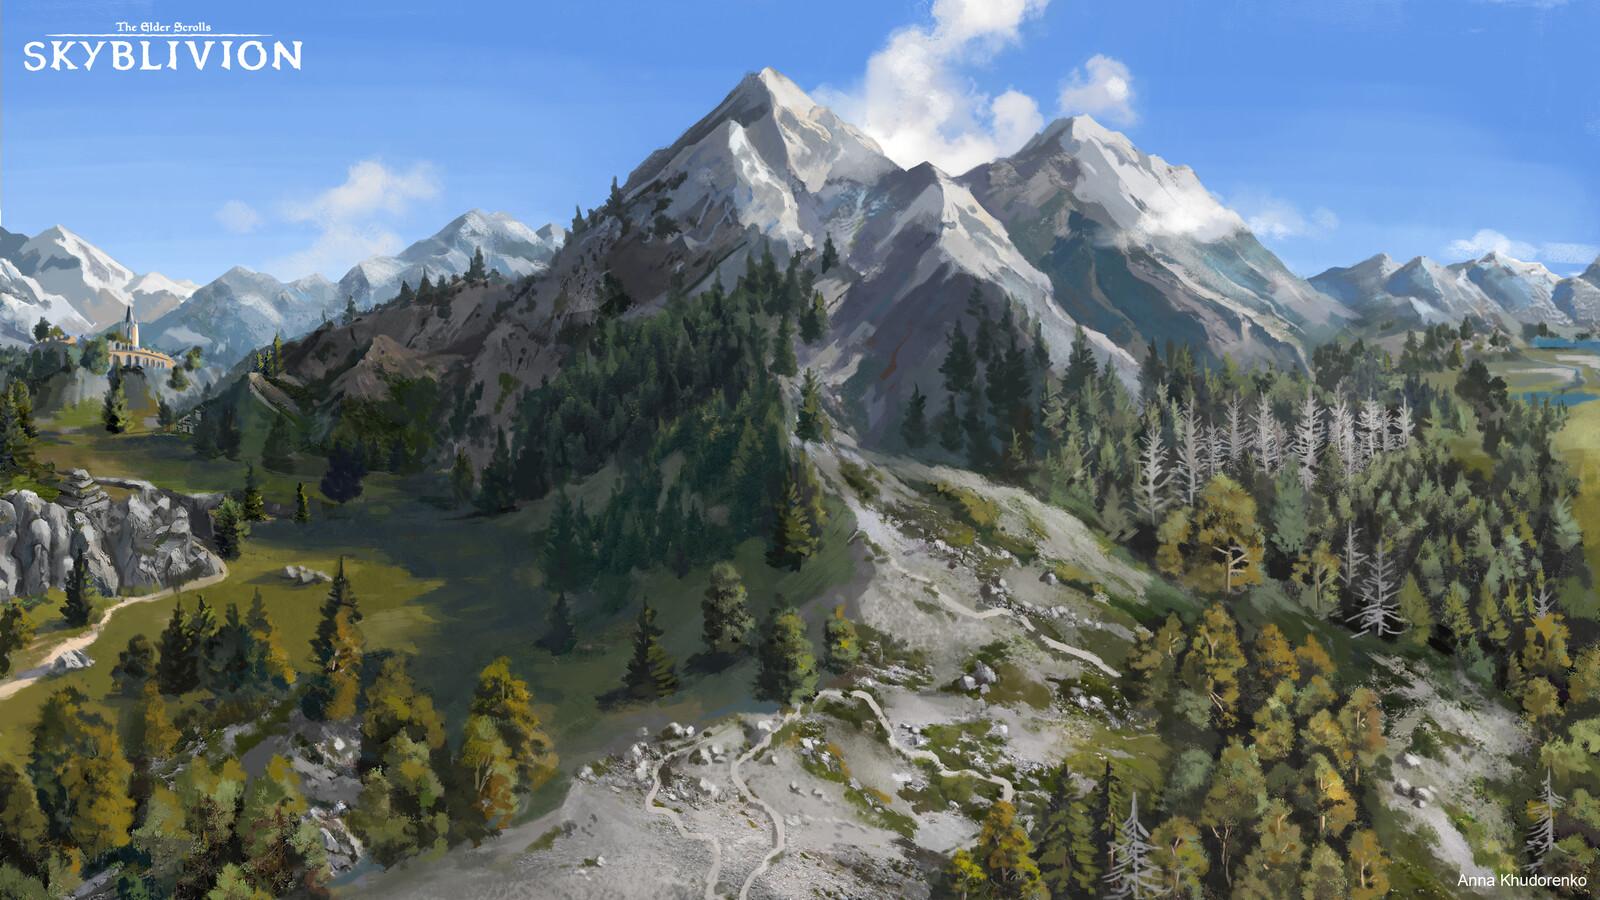 Skyblivion: Pine forest area